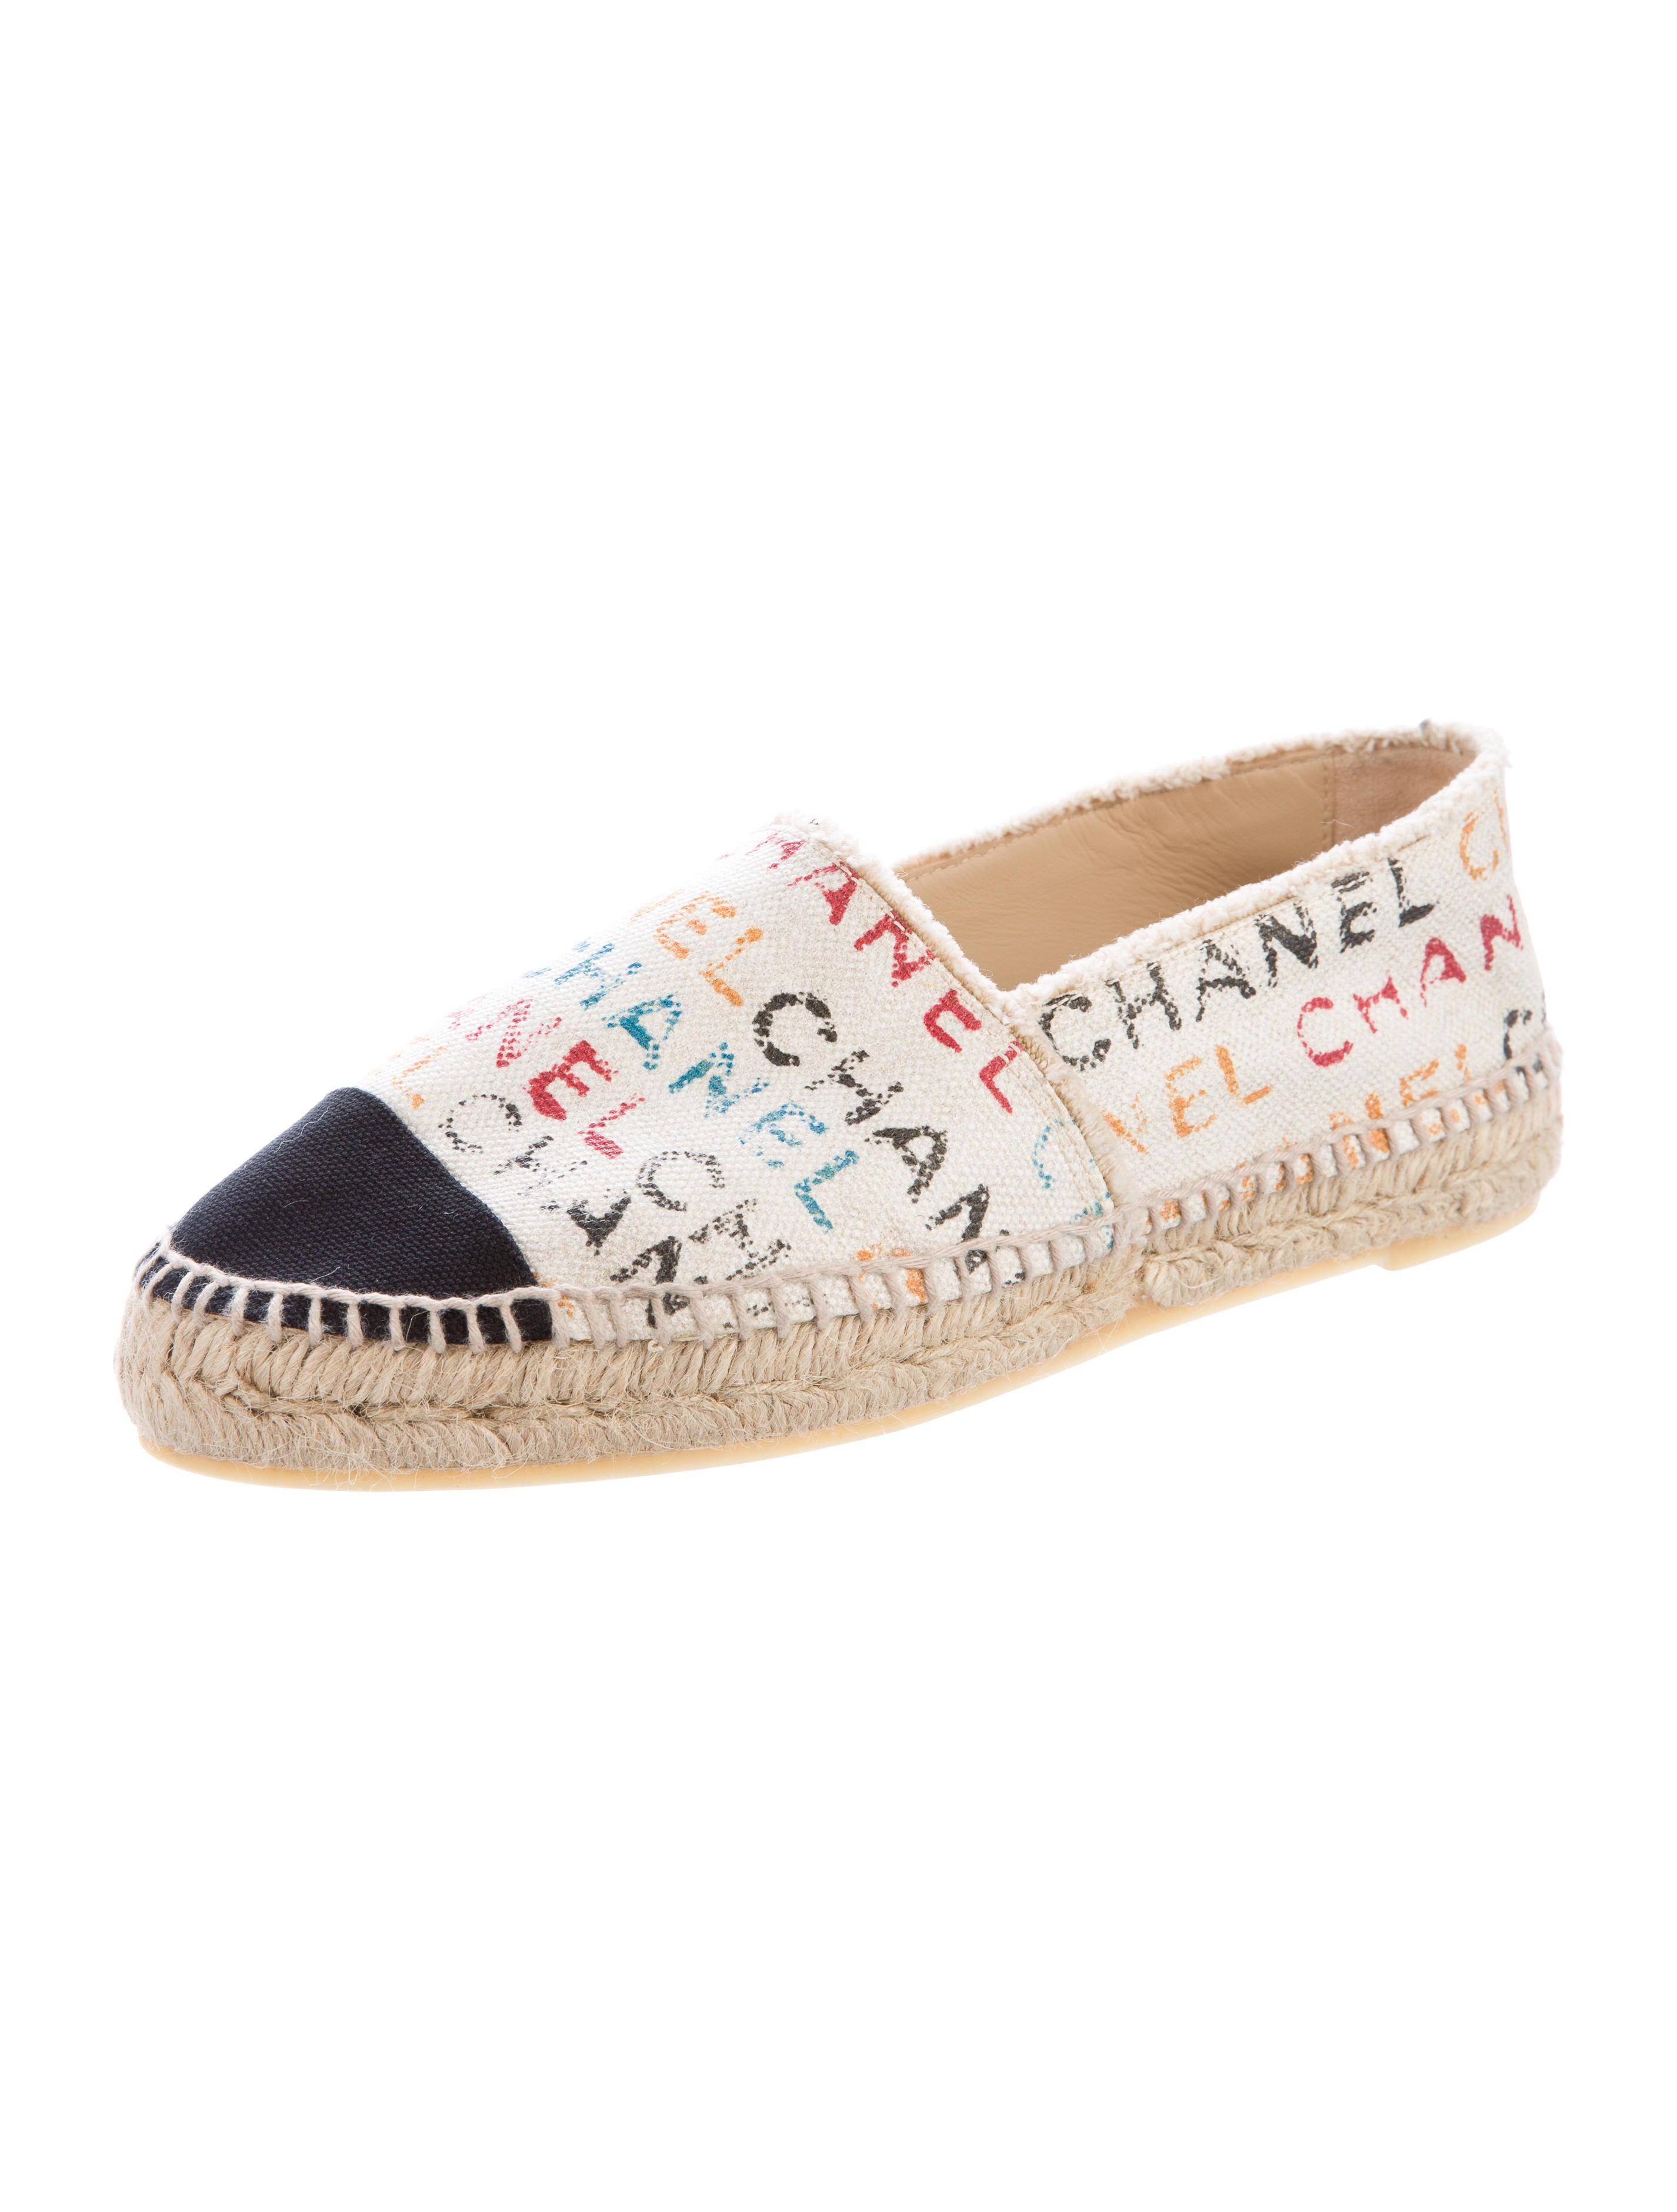 chanel canvas graffiti espadrilles shoes cha158254